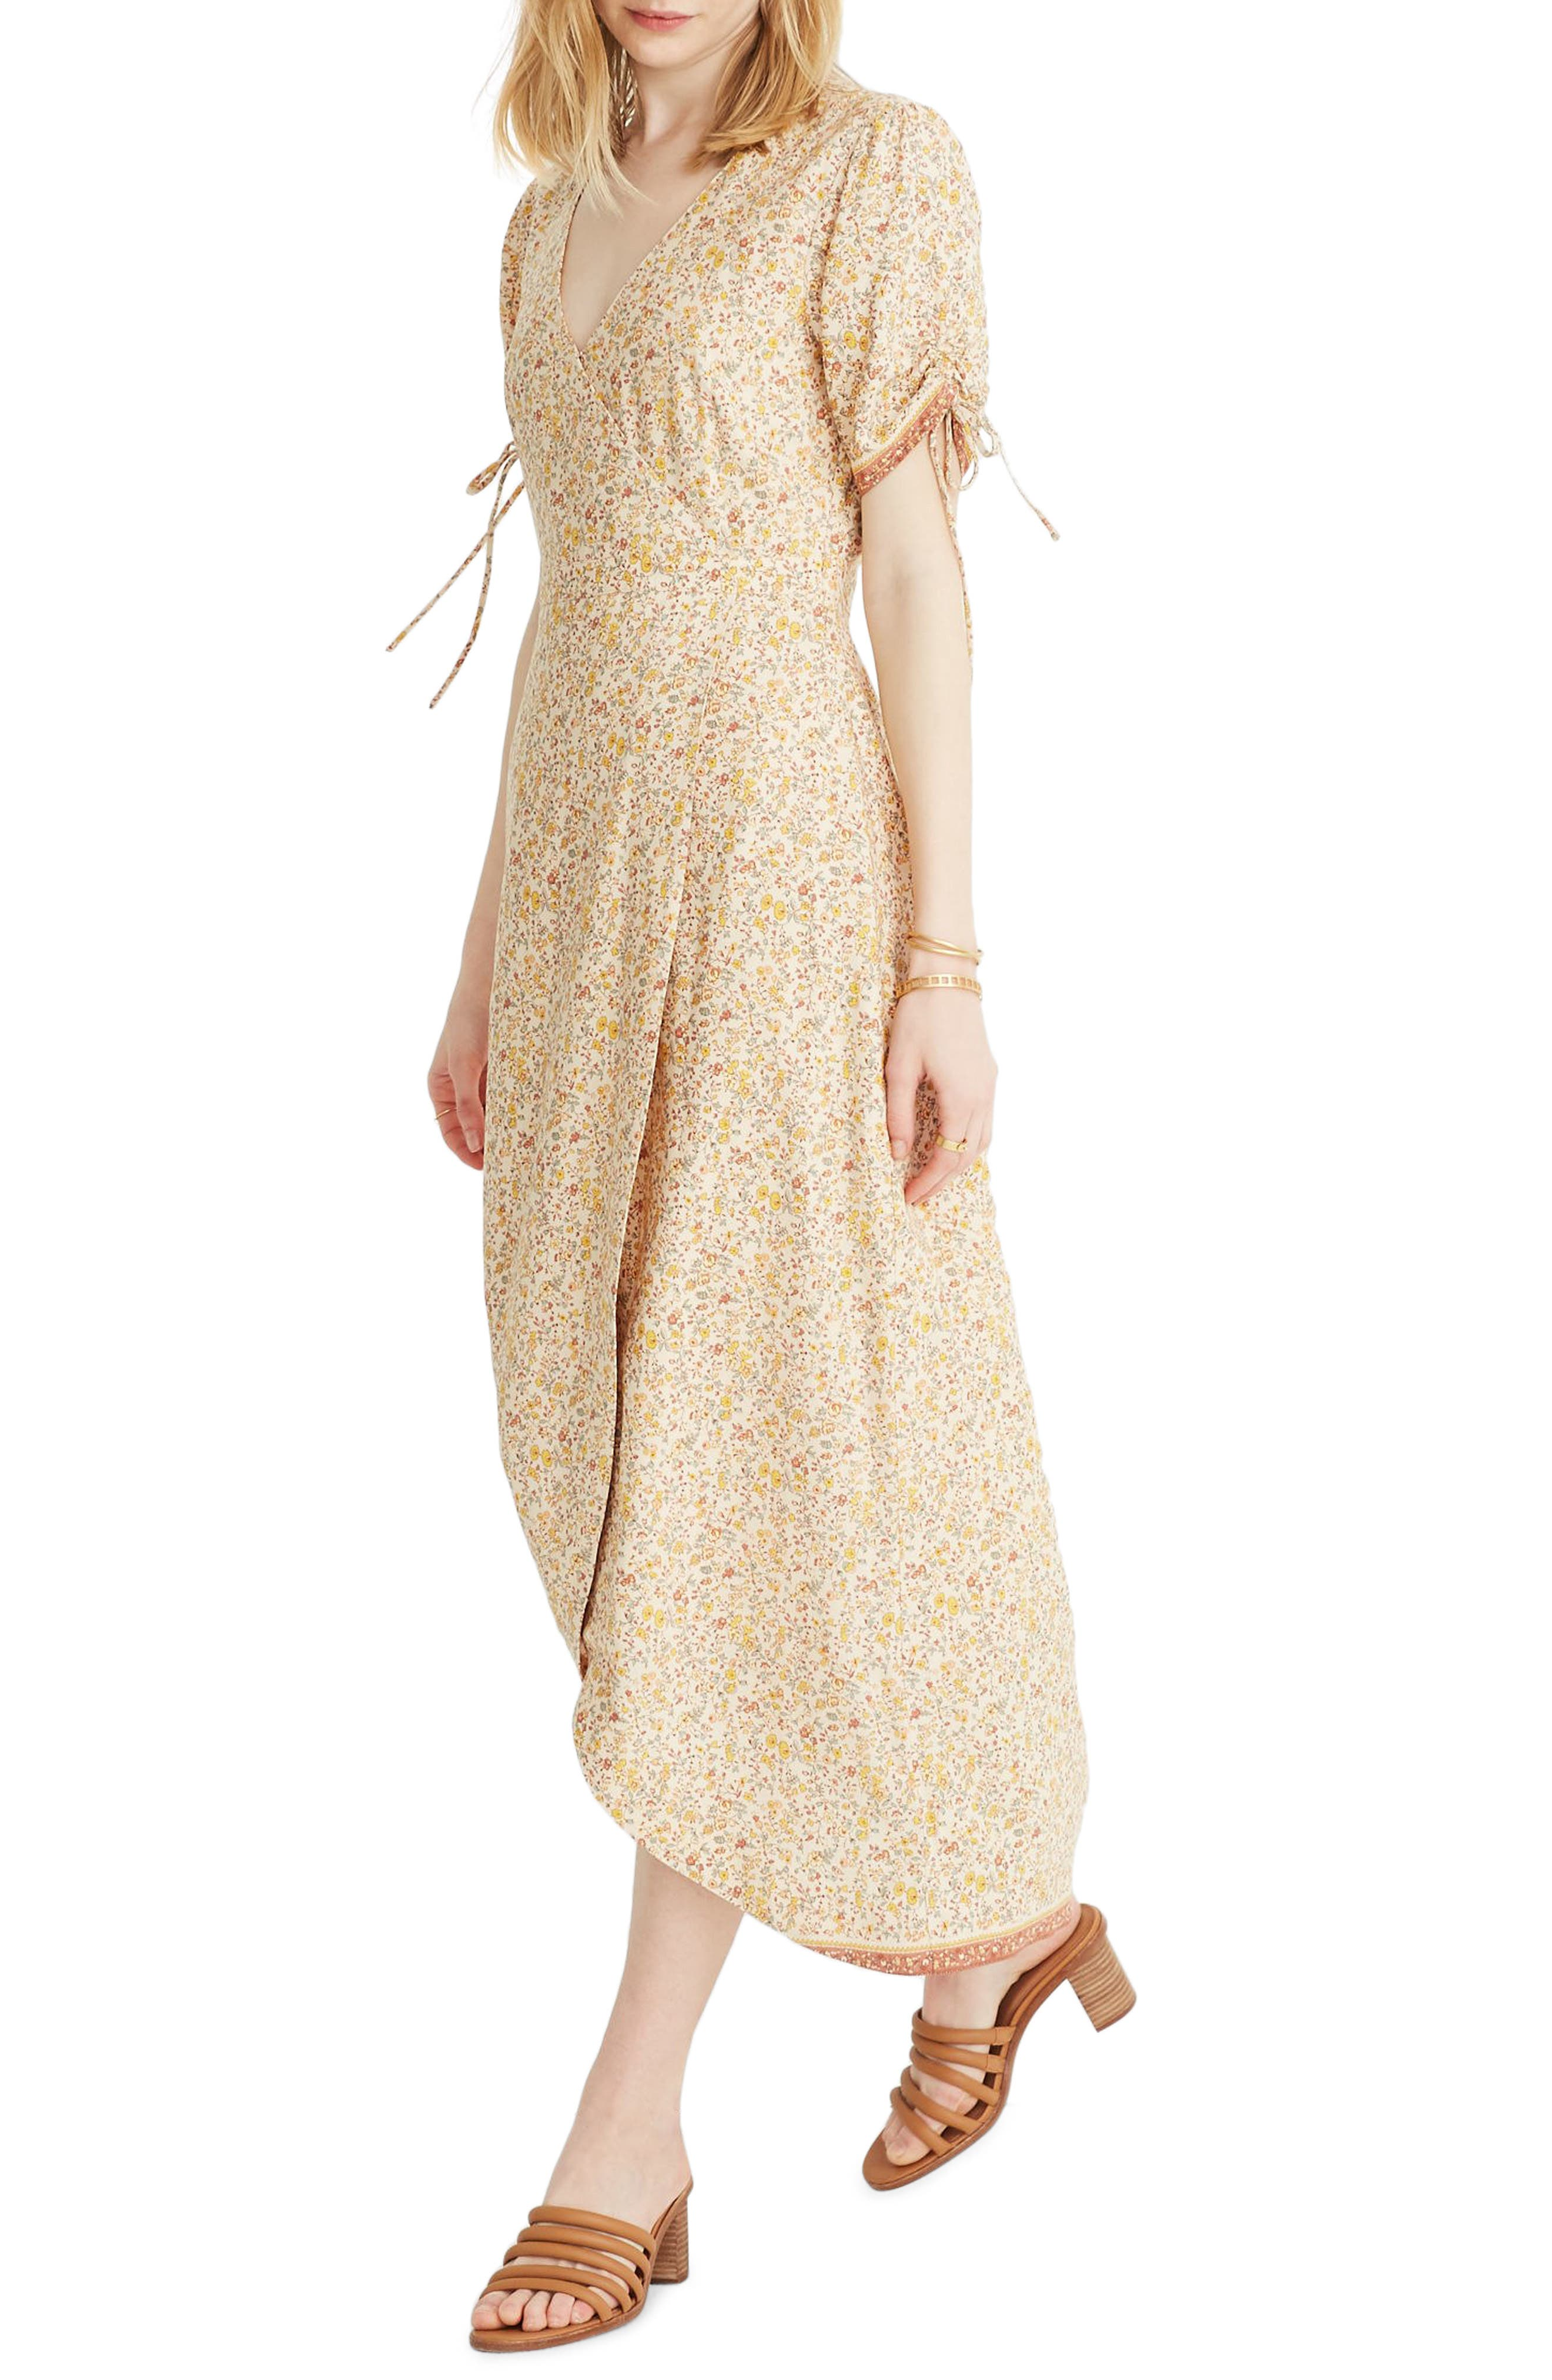 Madewell Blossoming Vines Peekaboo Sleeve Maxi Dress, Yellow